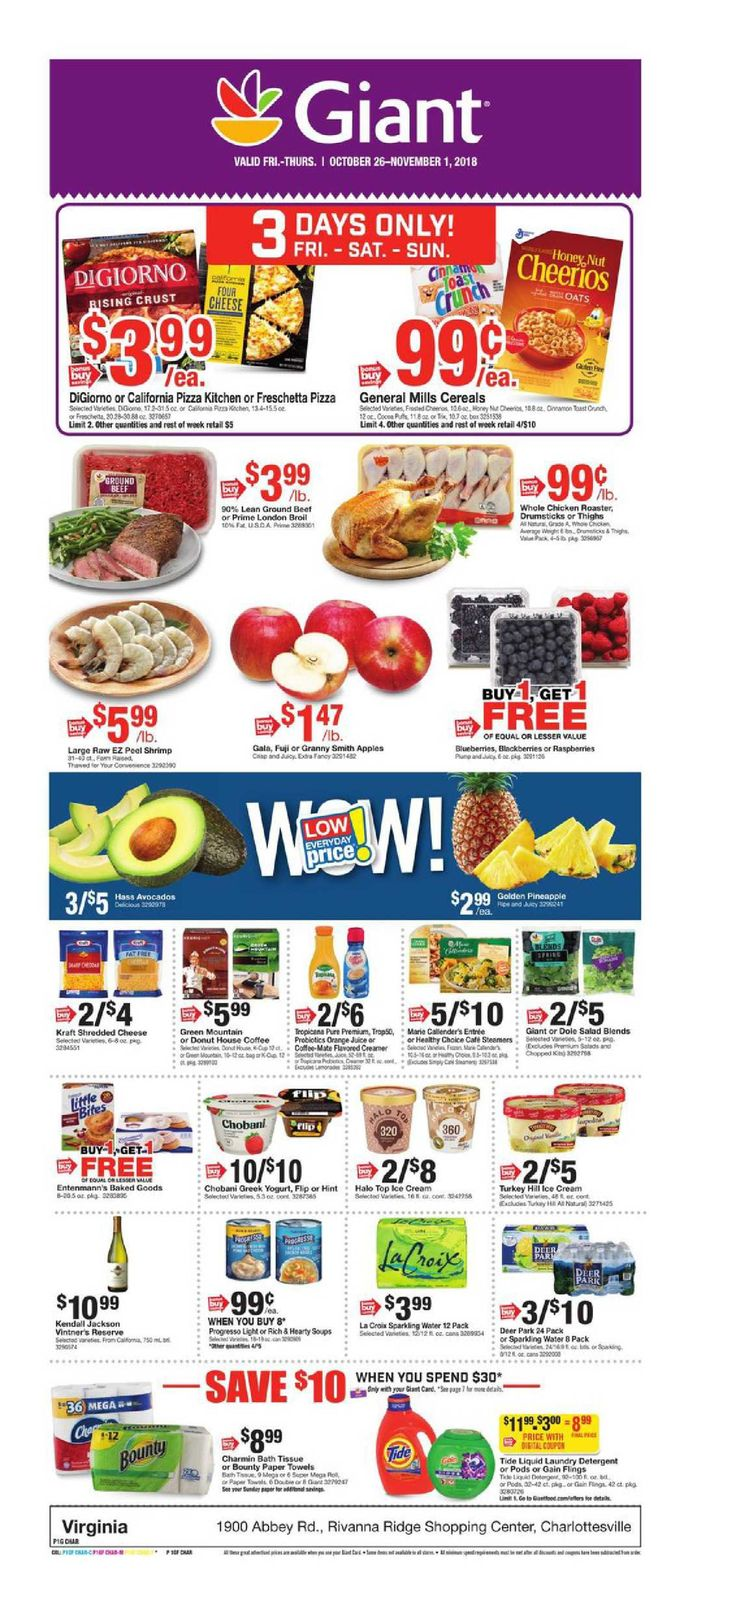 Giant Food Weekly Circular Flyer December 21 27, 2018